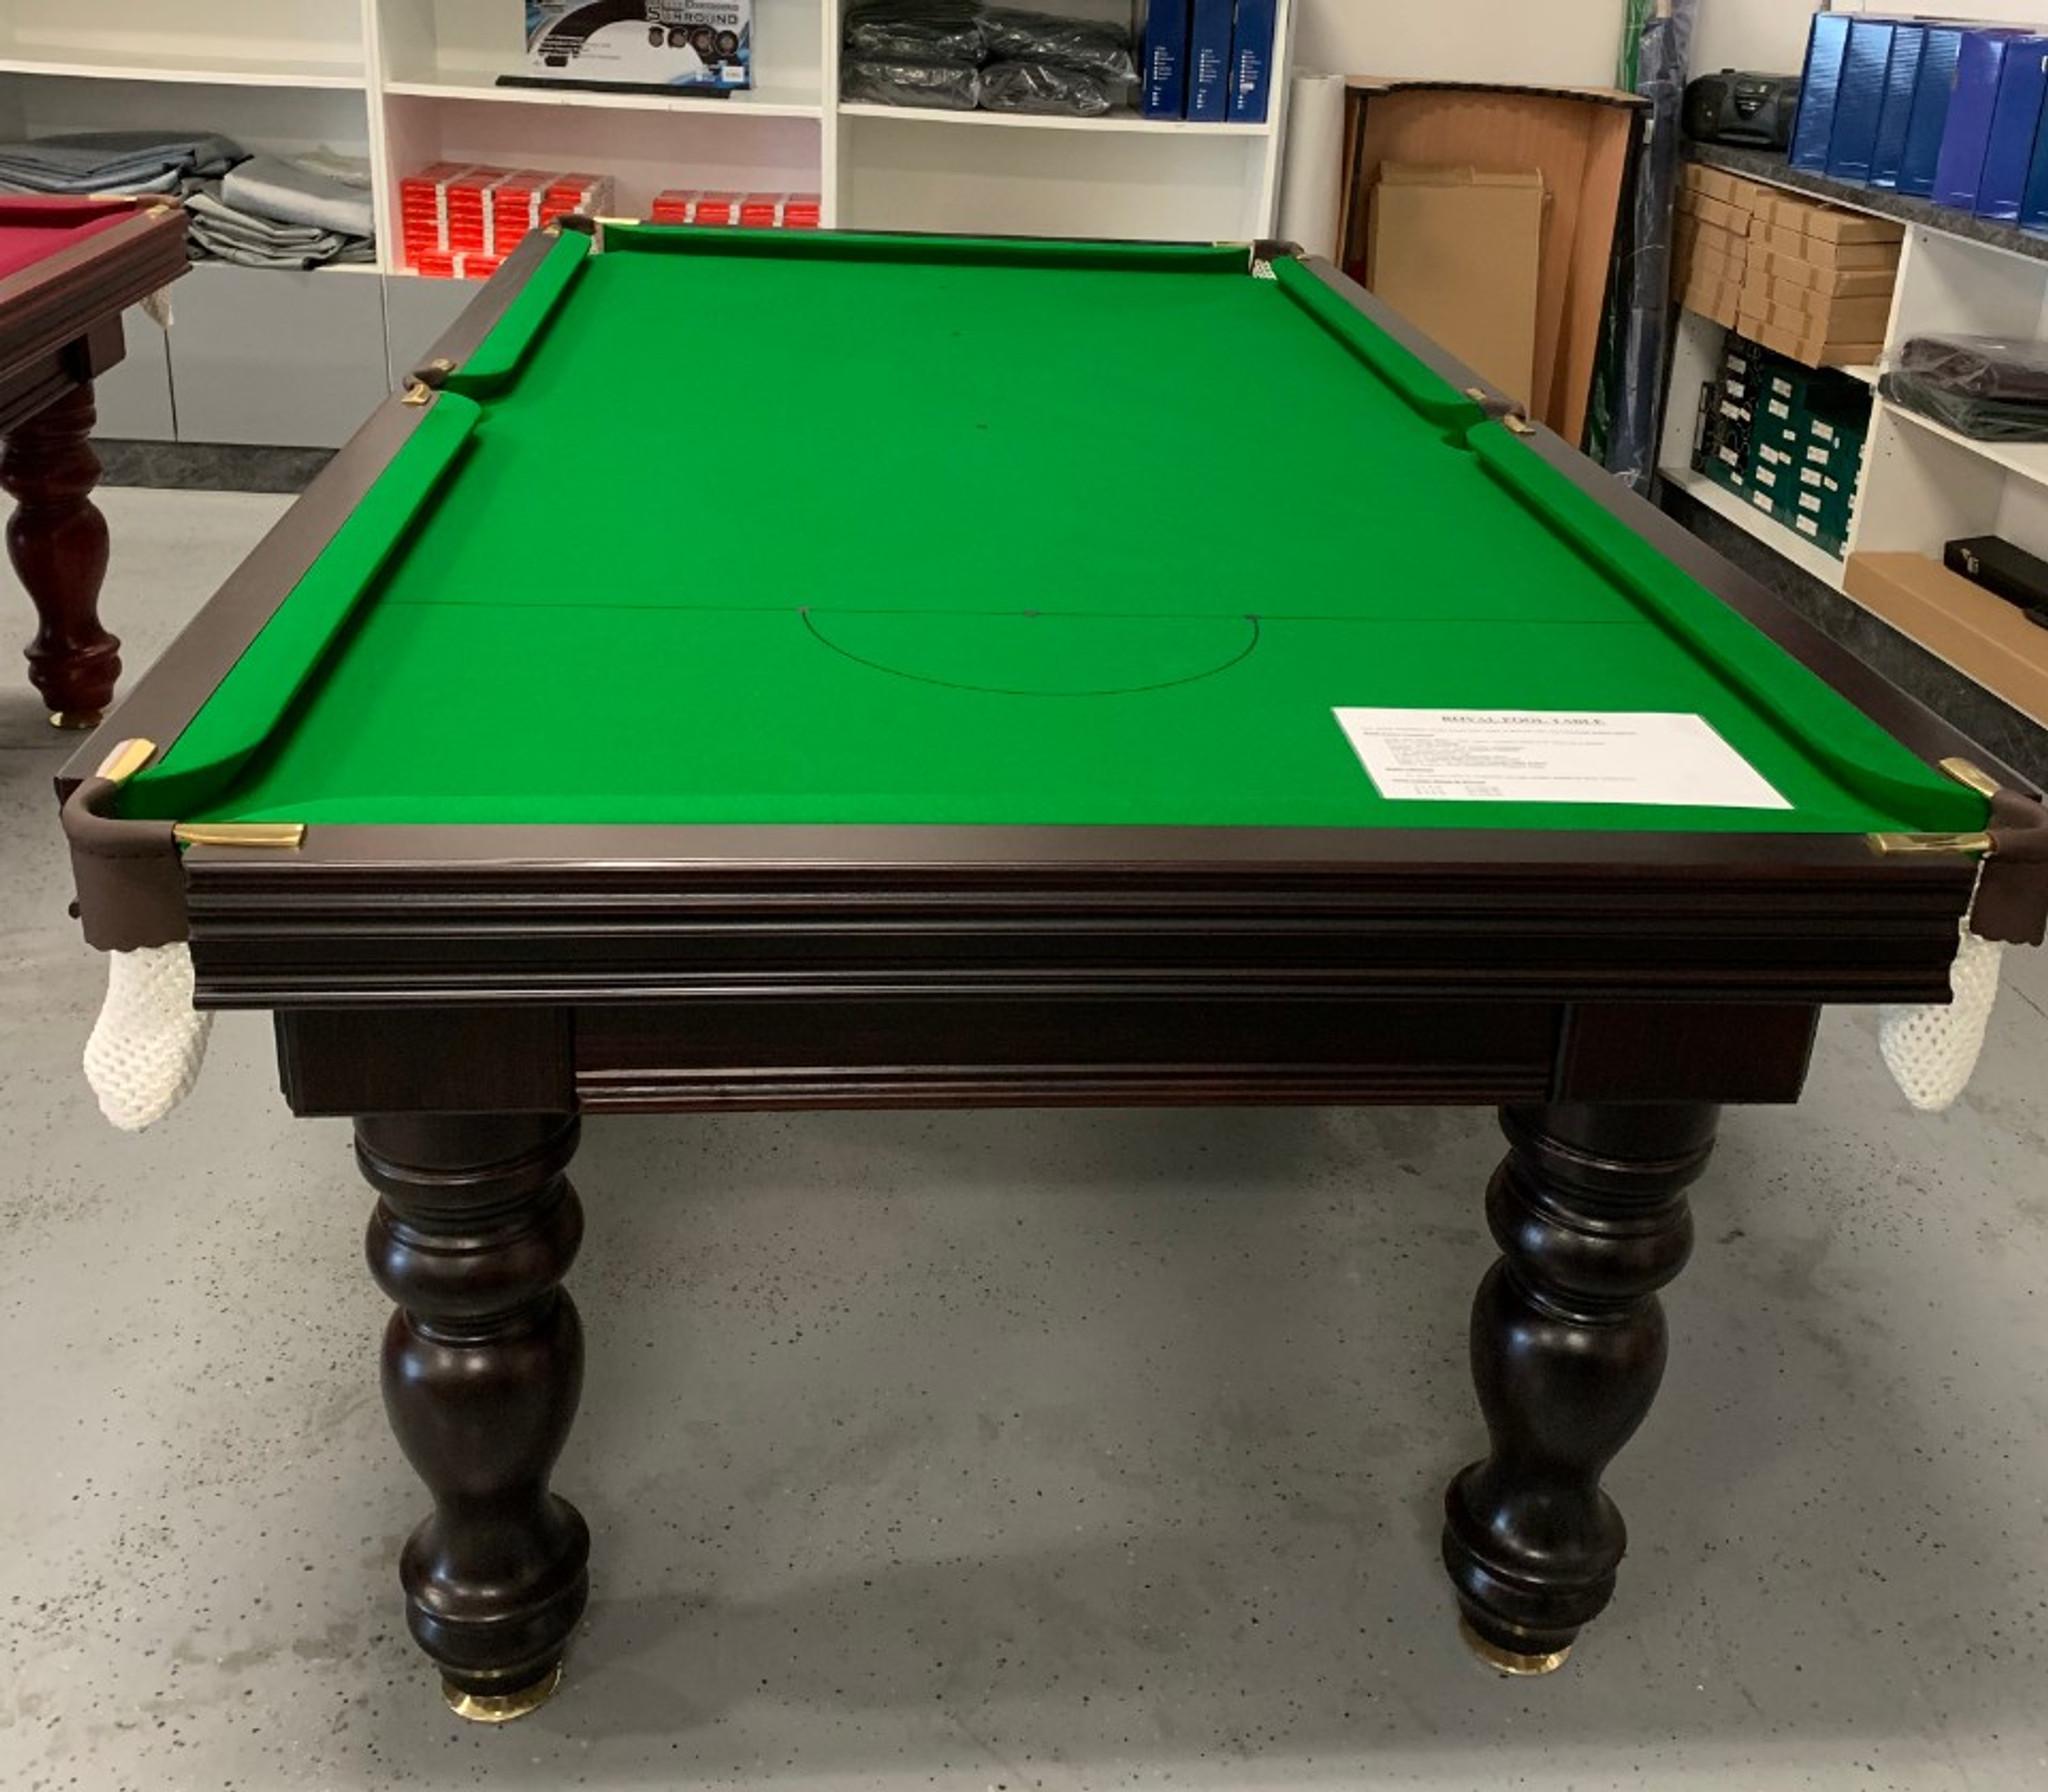 Astra Billiards & 8\u0027 Royal Pool Table - Walnut Stain Green Cloth